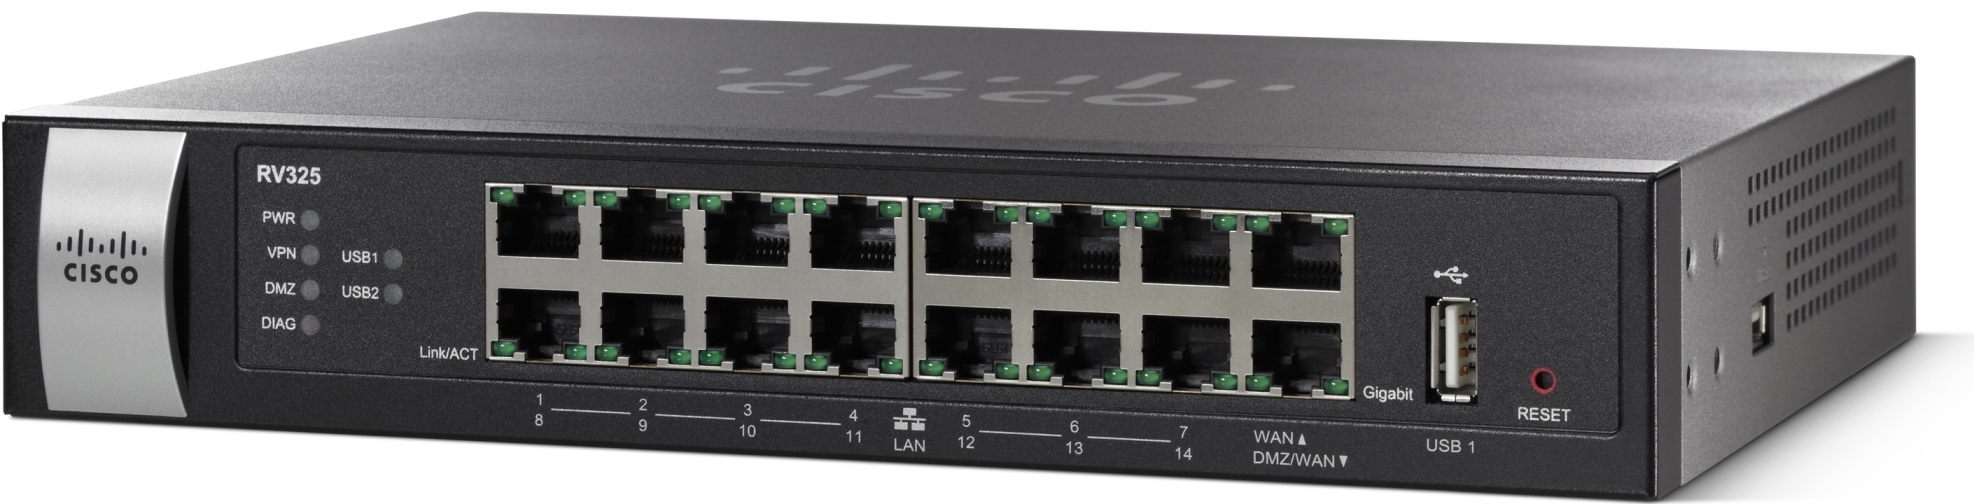 Cisco VPN Router RV325, 14x GE LAN + 2xWAN +2x USB